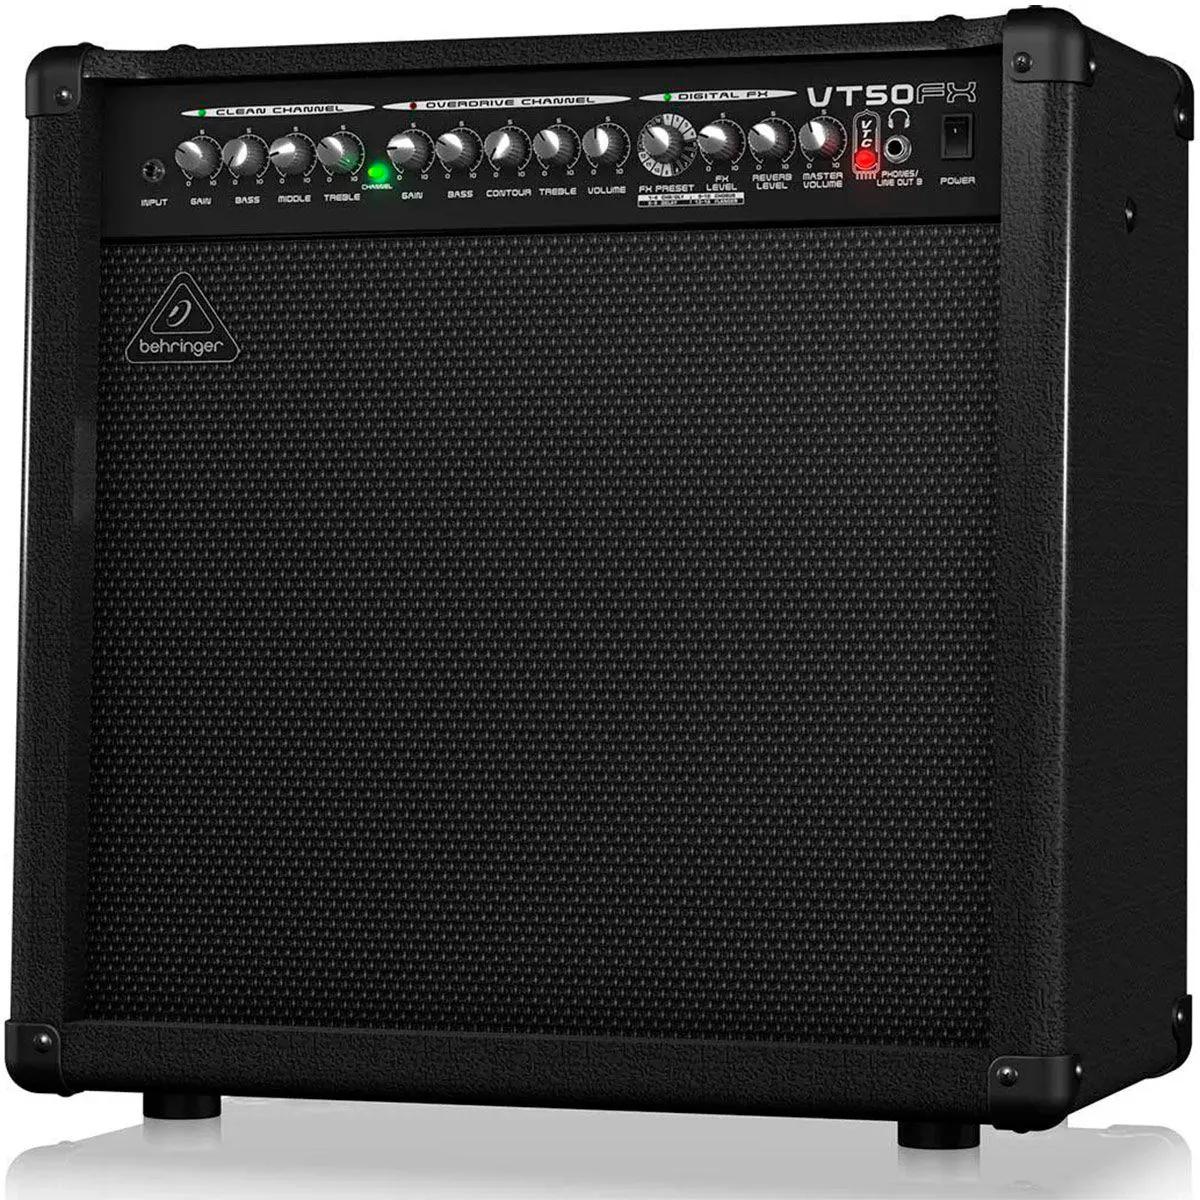 Caixa Amplificada Behringer Virtube VT50FX 50W 1x12